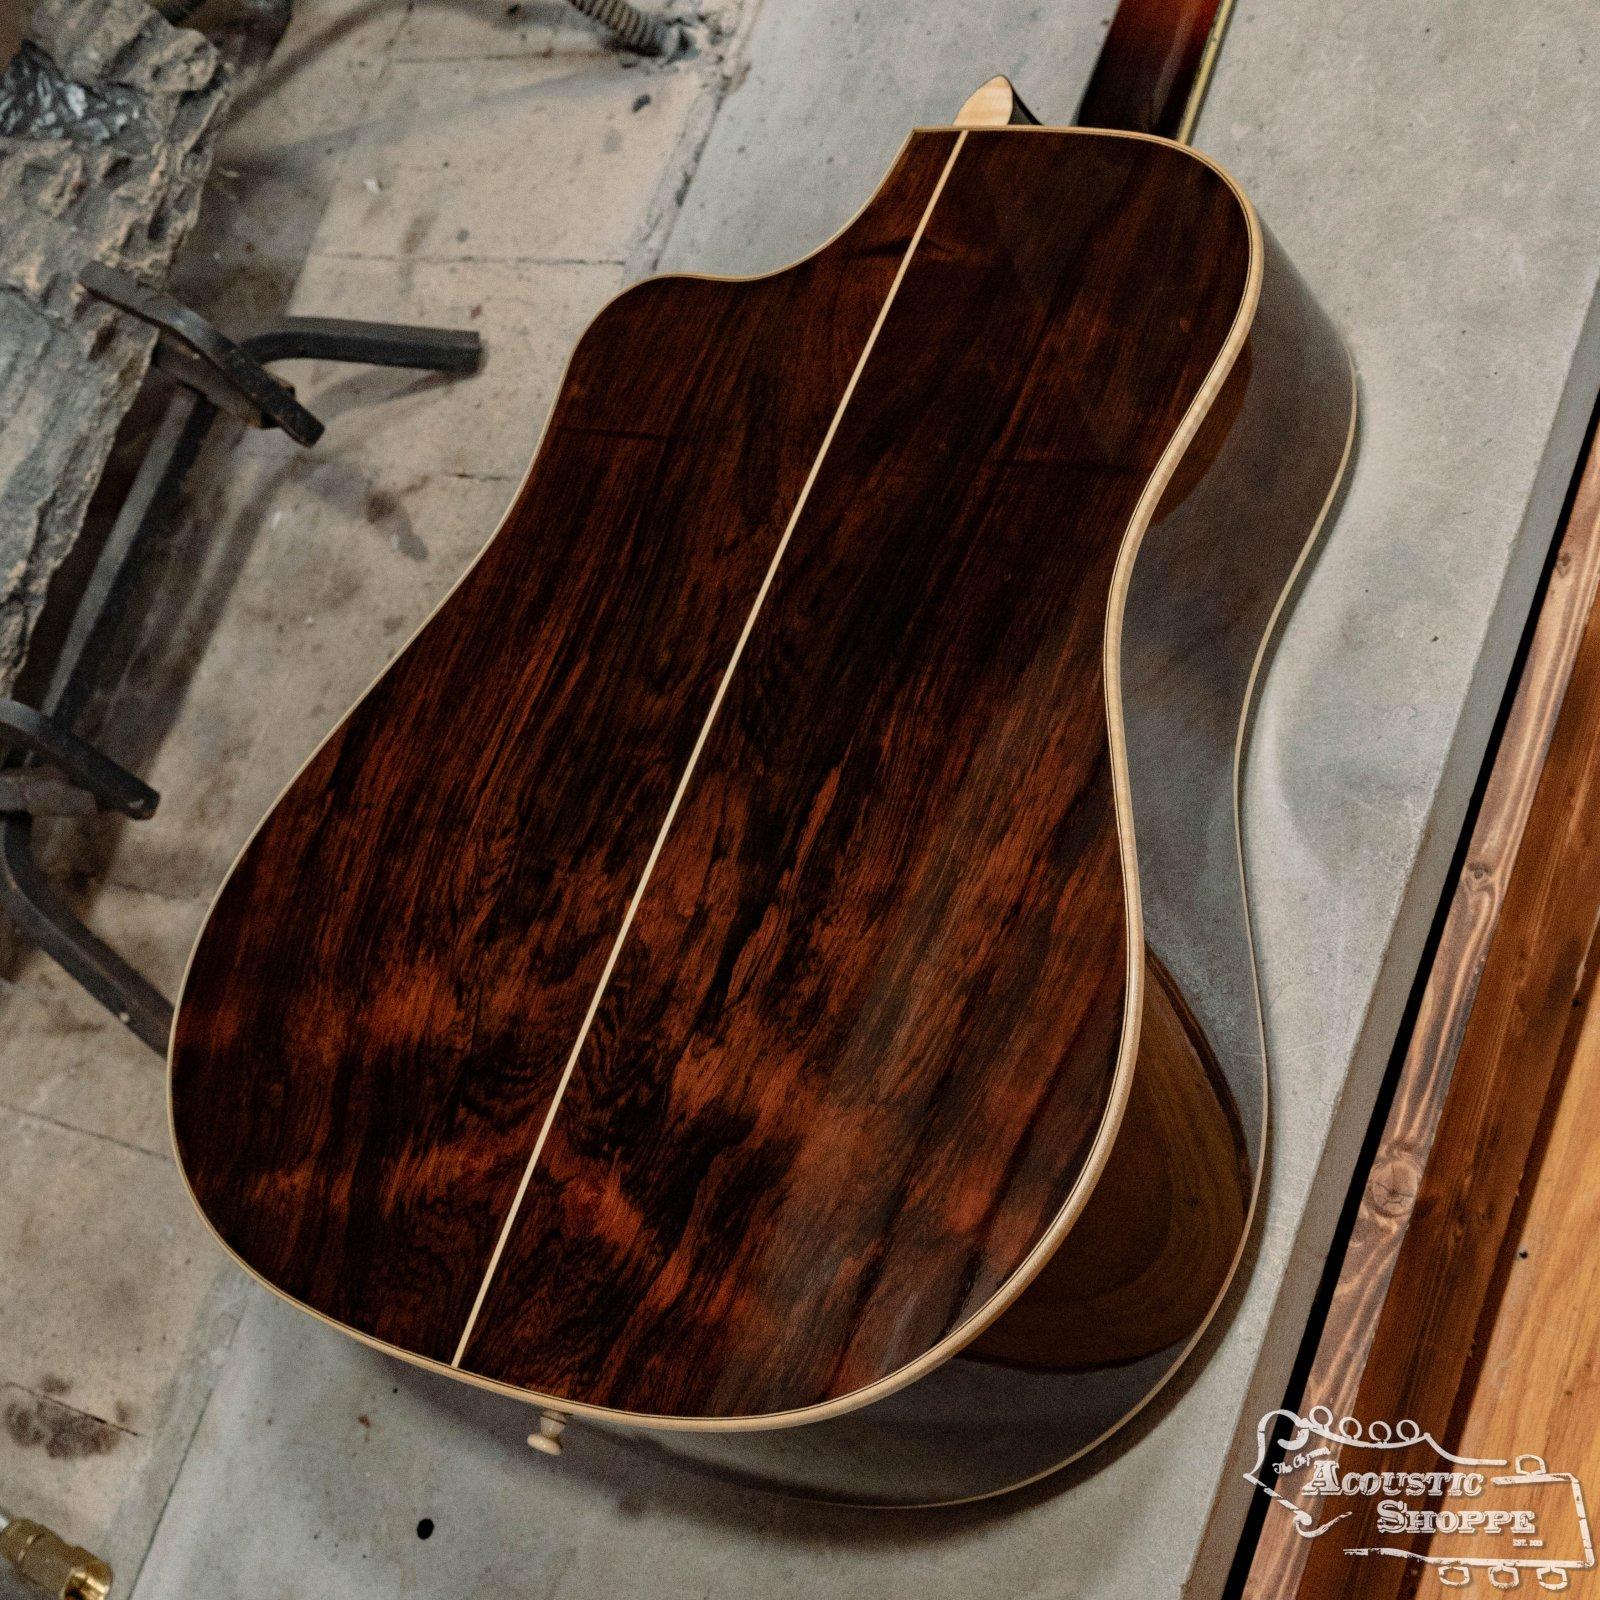 (Used) Noble Custom Cutaway Dreadnought Adirondack Spruce Top/Brazilian Rosewood Back & Sides